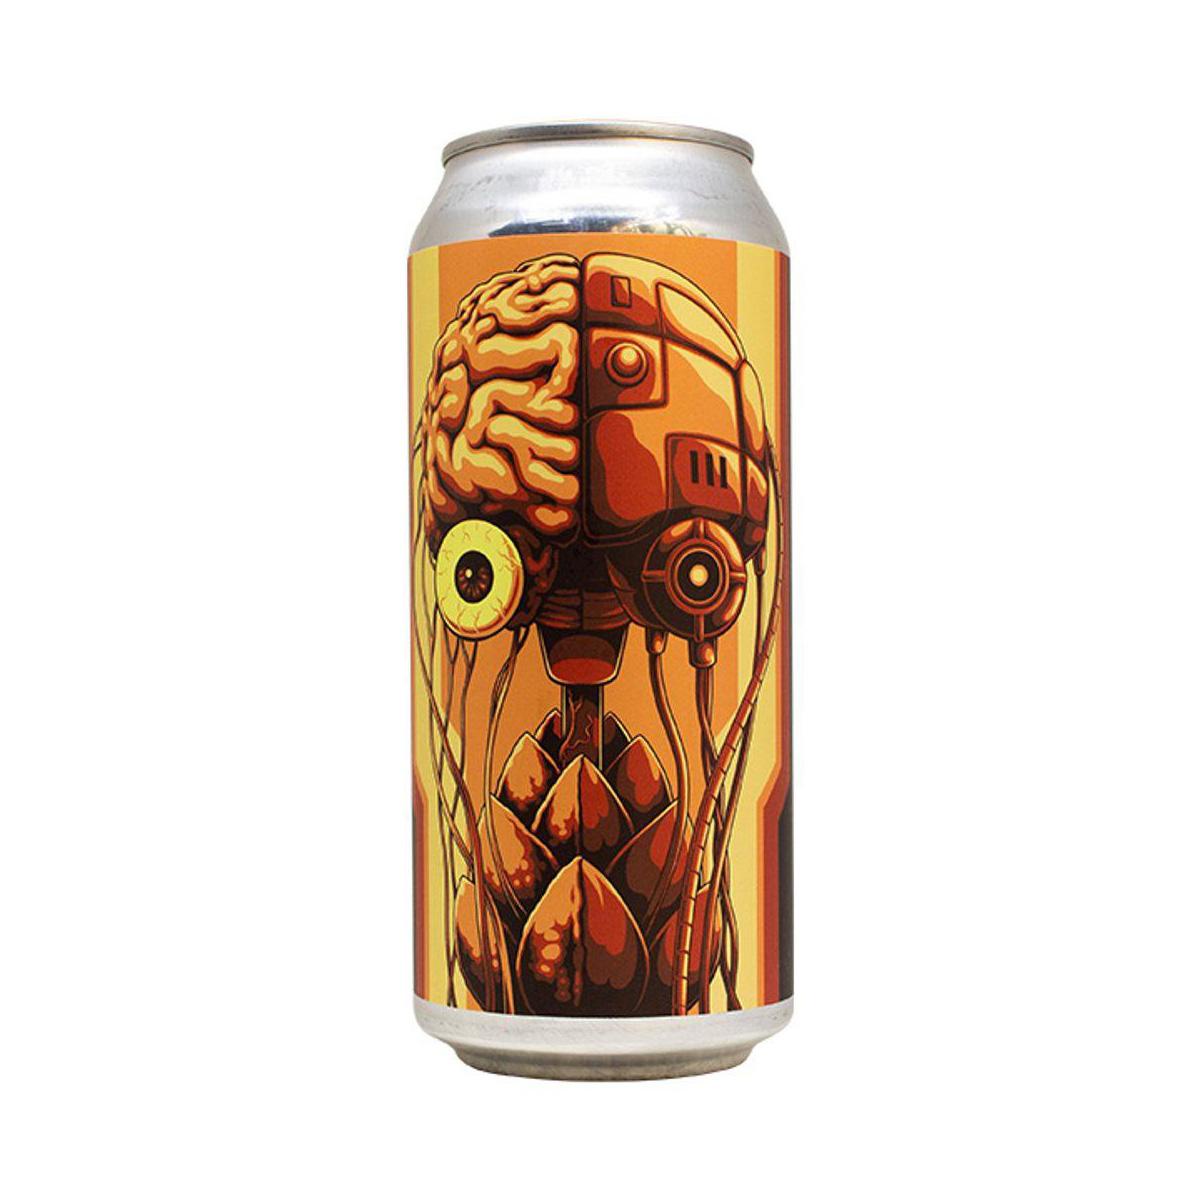 Cerveja Dogma Hybrid Minds German Pils Lata 473ml  - Geek N